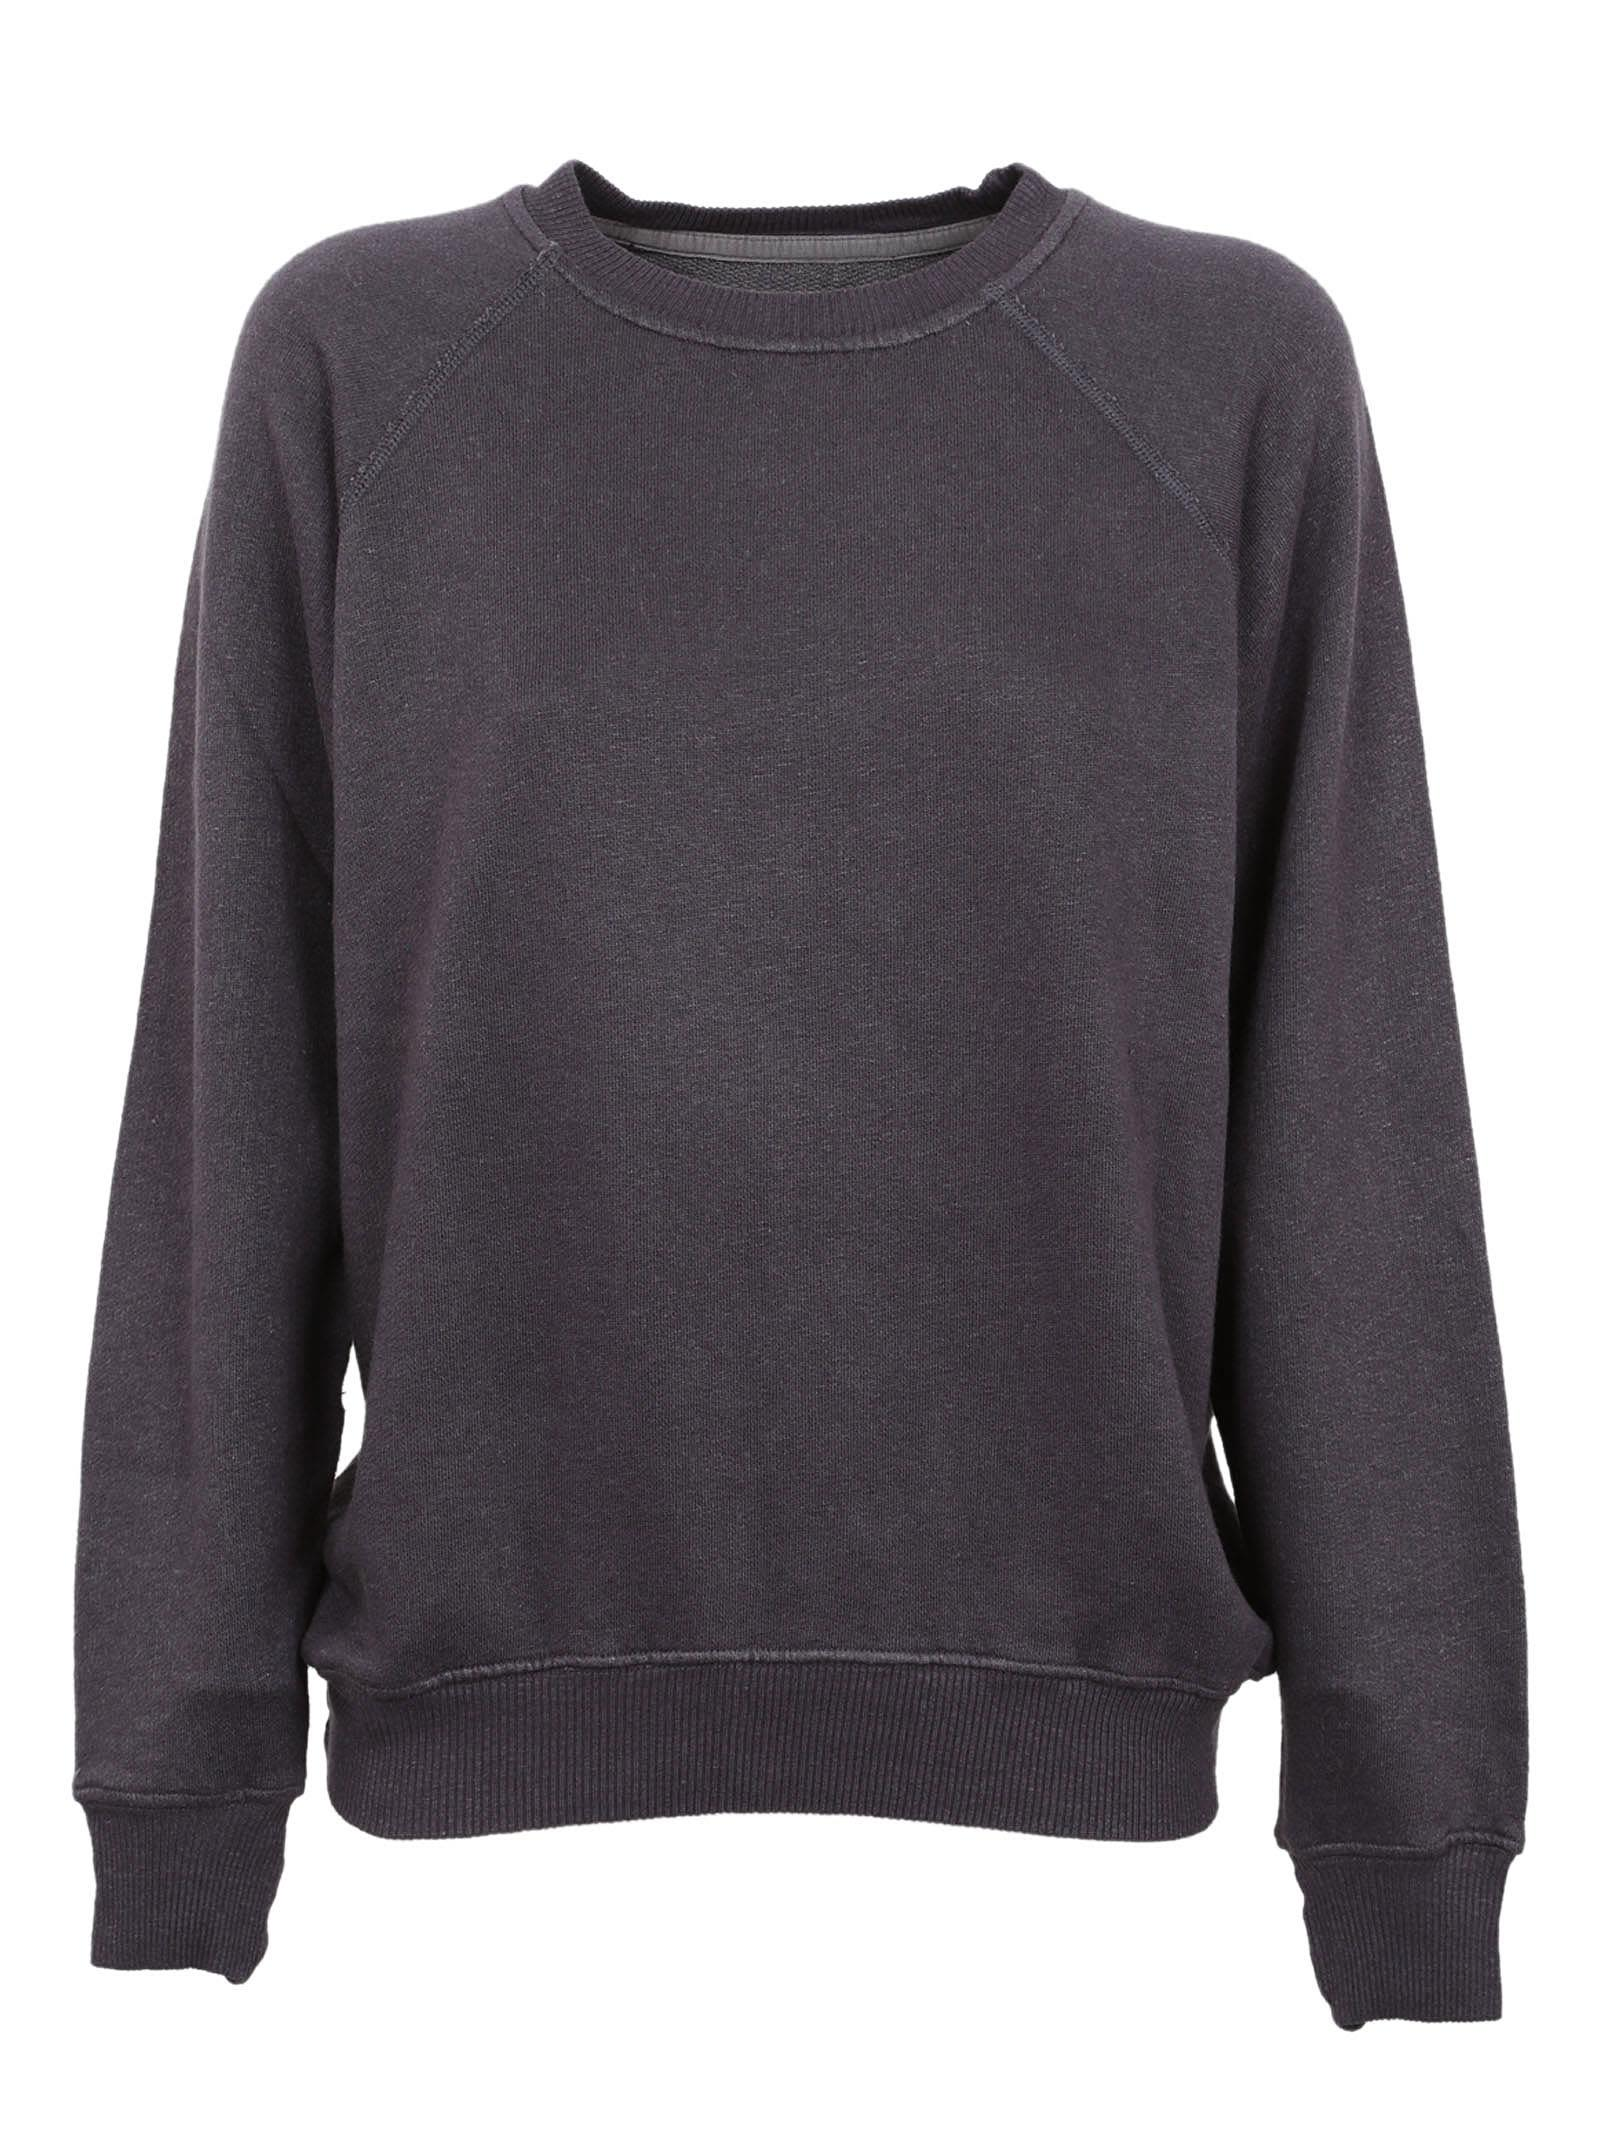 Isabel Marant Fang Sweatshirt